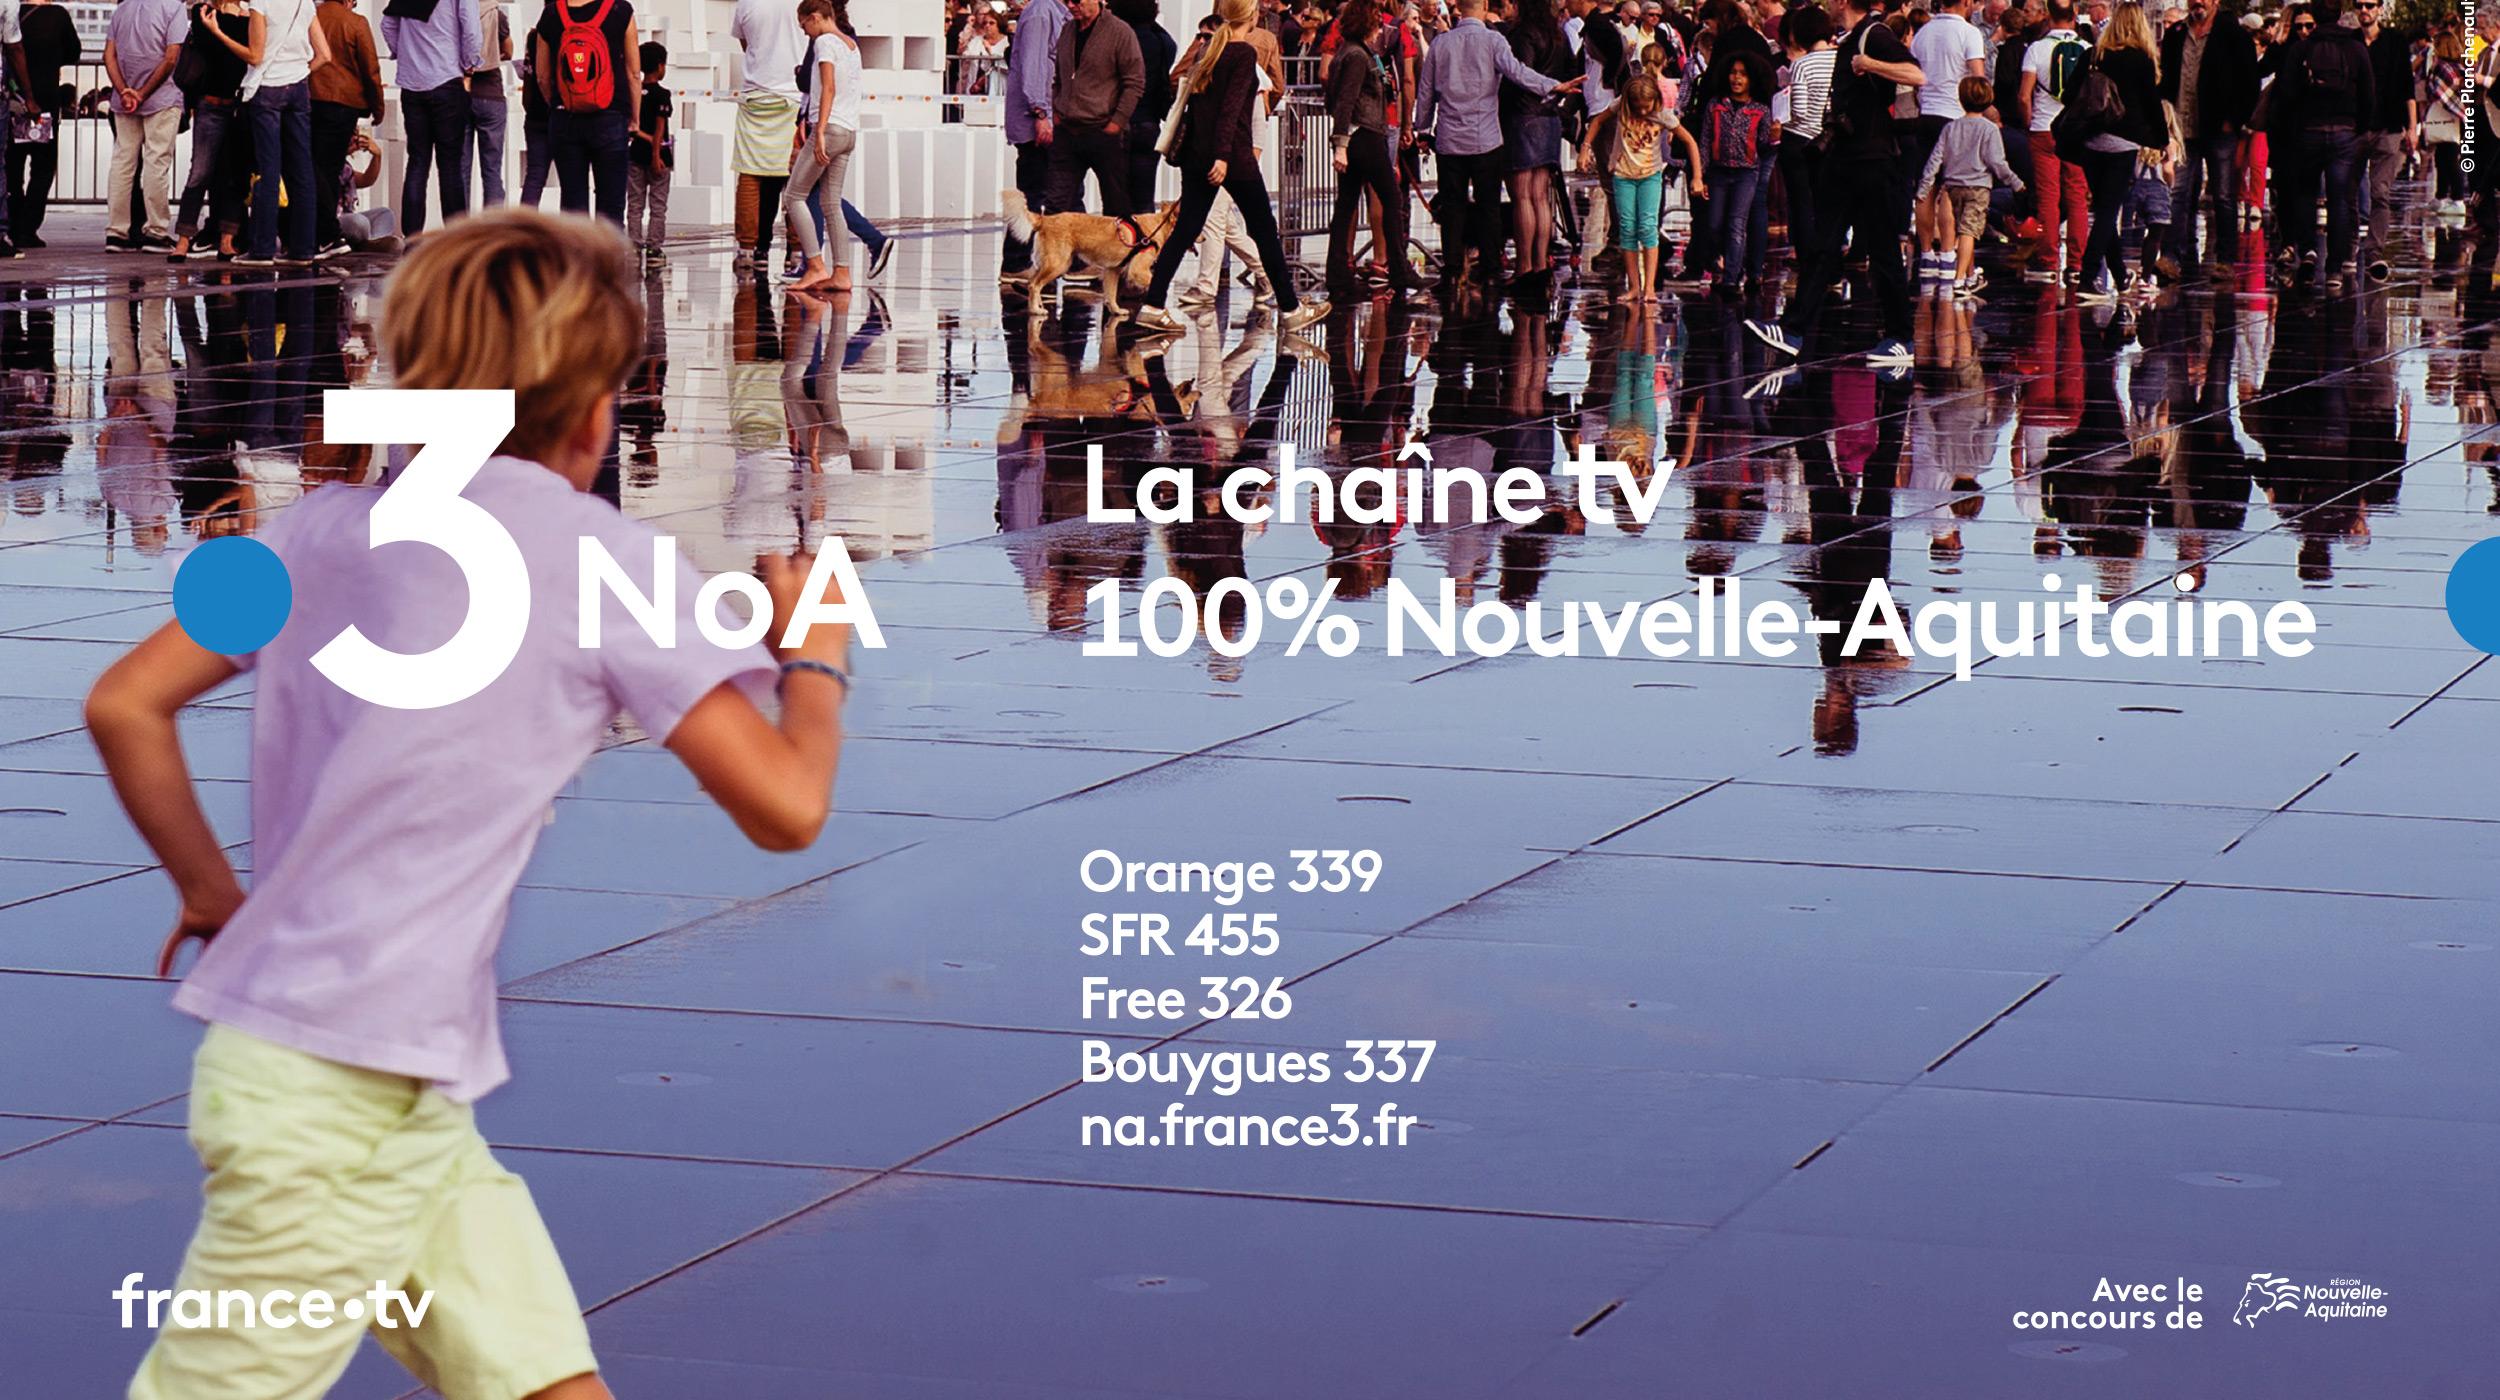 Annonce presse France 3 NOA